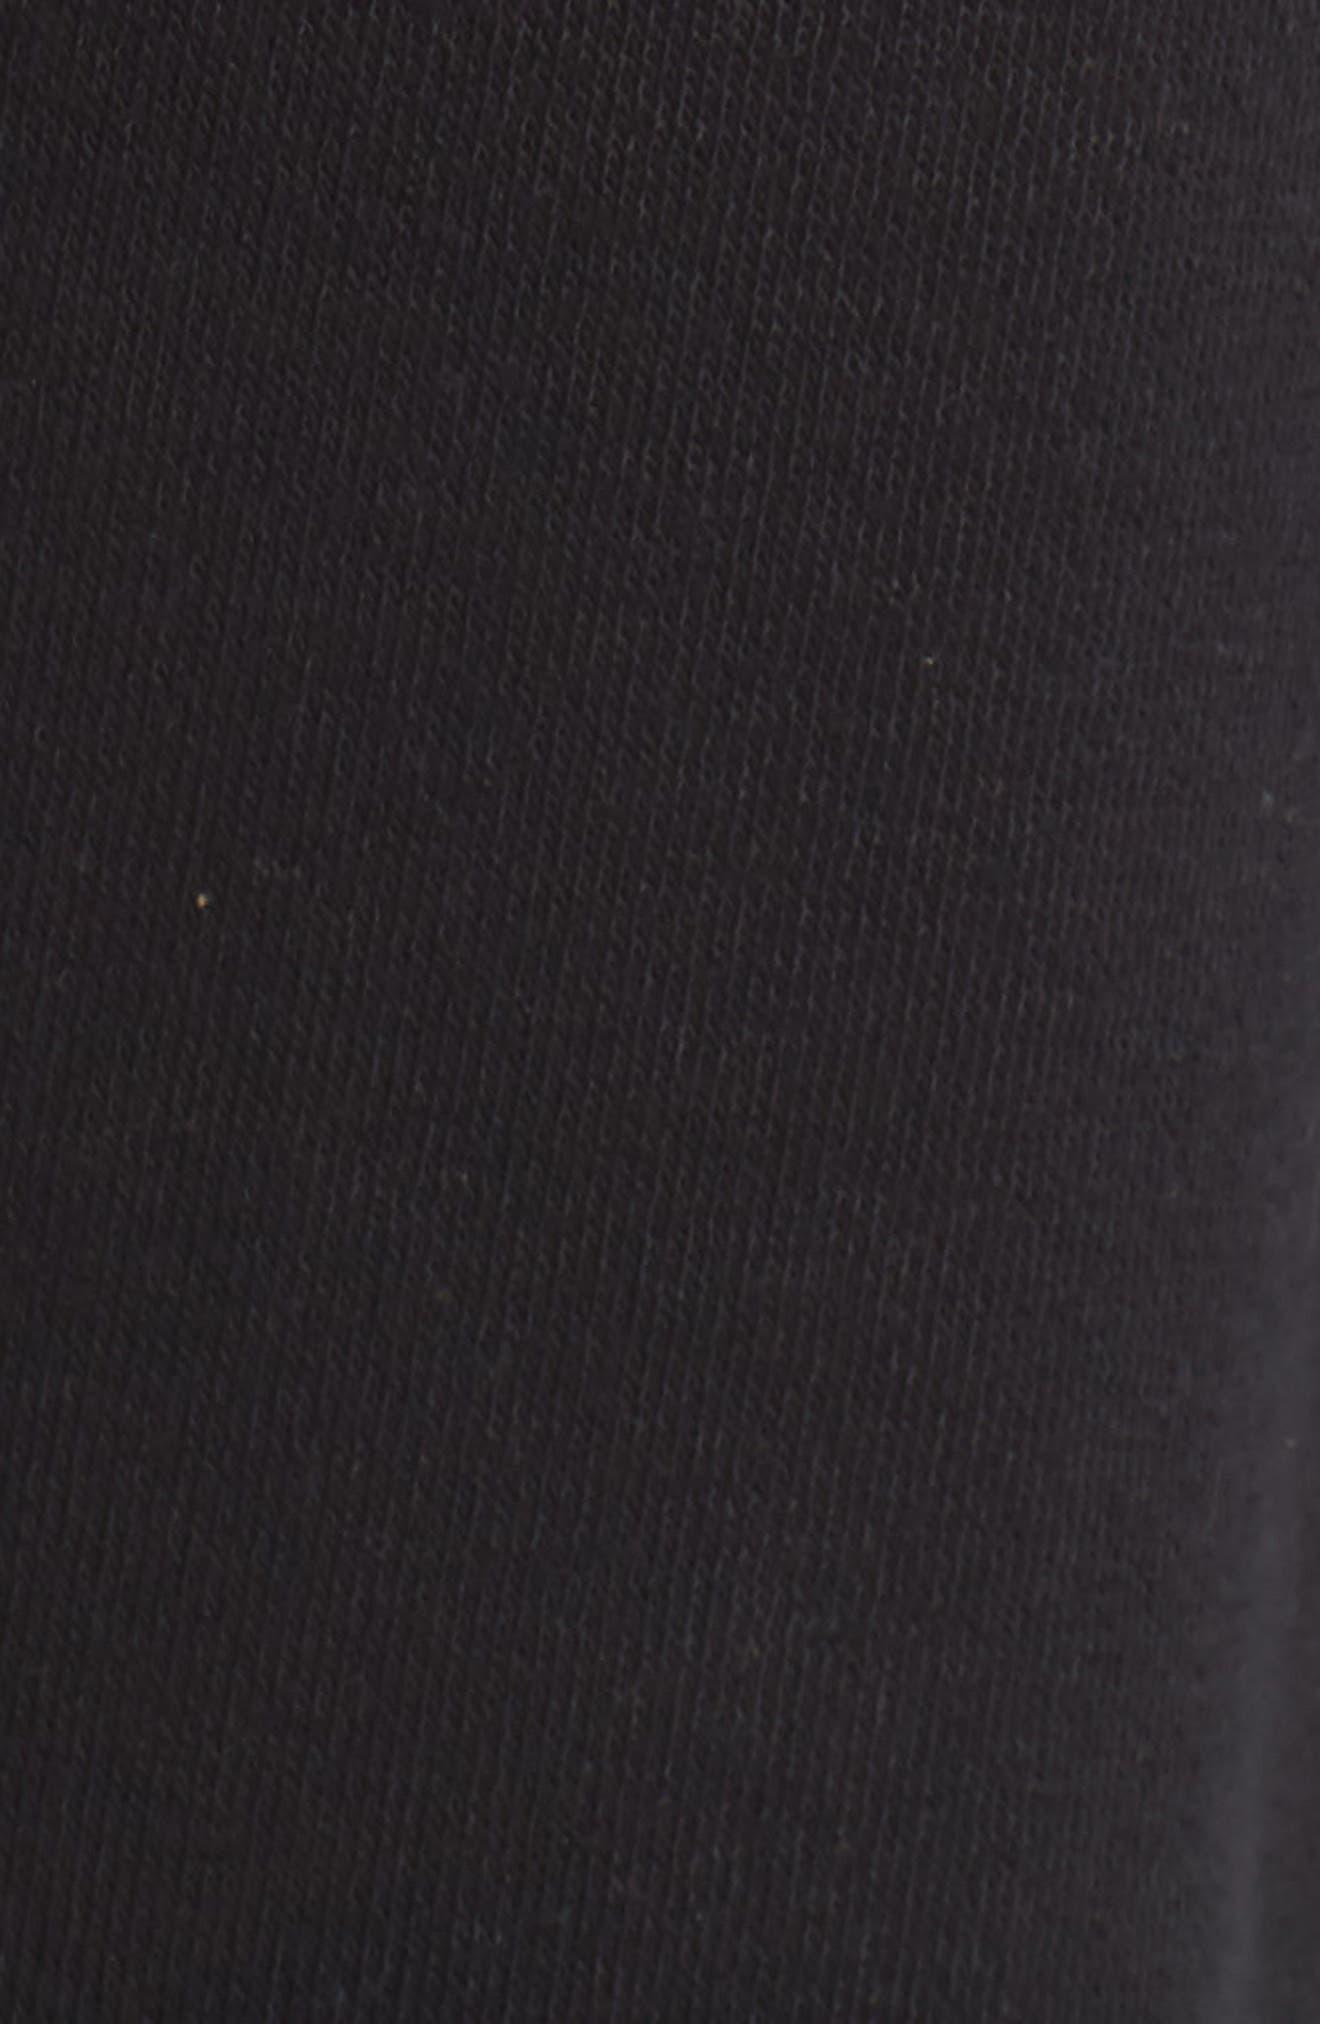 Dreamy Fleece Jogger Pants,                             Alternate thumbnail 6, color,                             Black